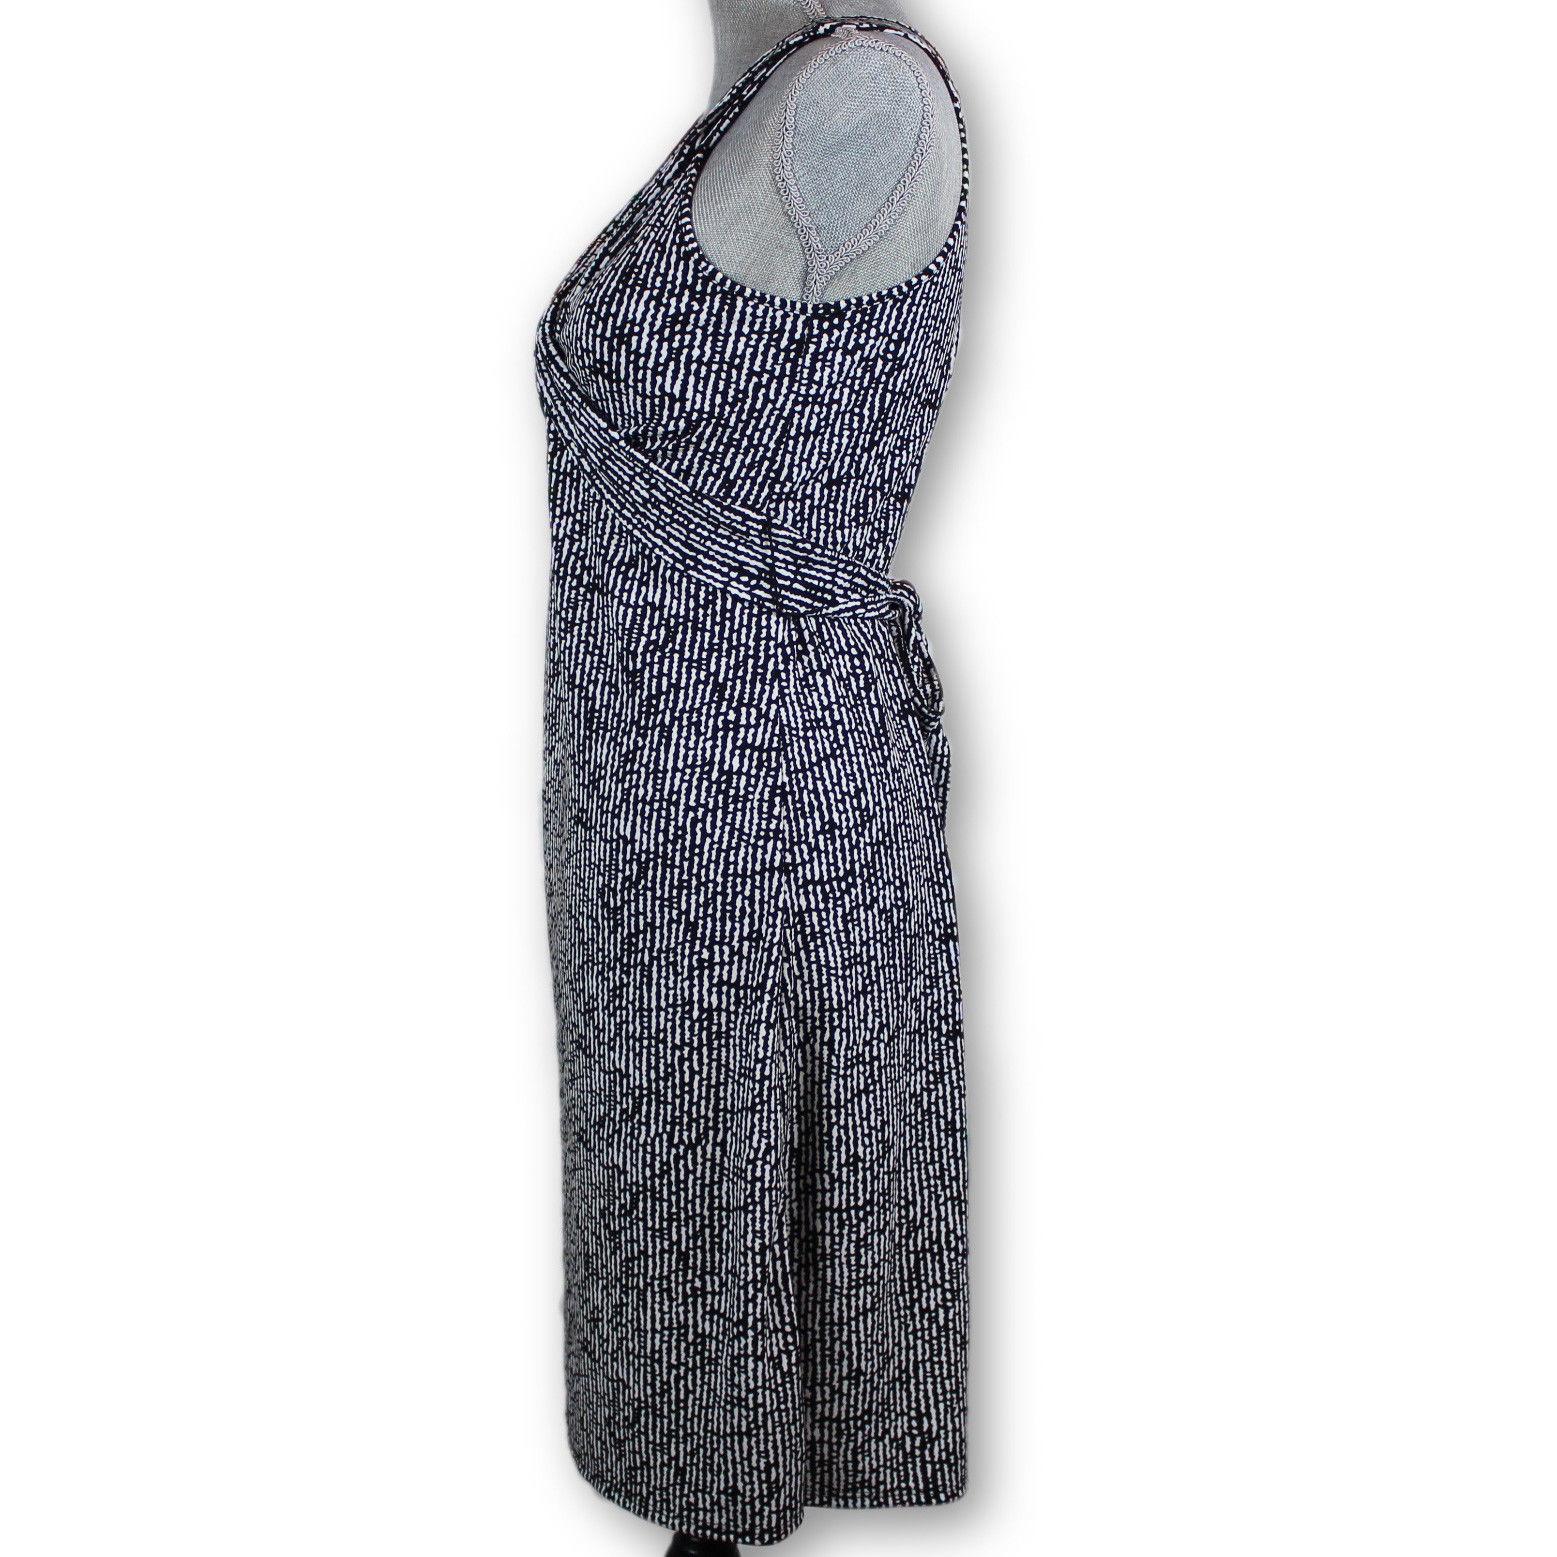 ANN TAYLOR LOFT Dress Size 2 Black and White Print Sleeveless v neck